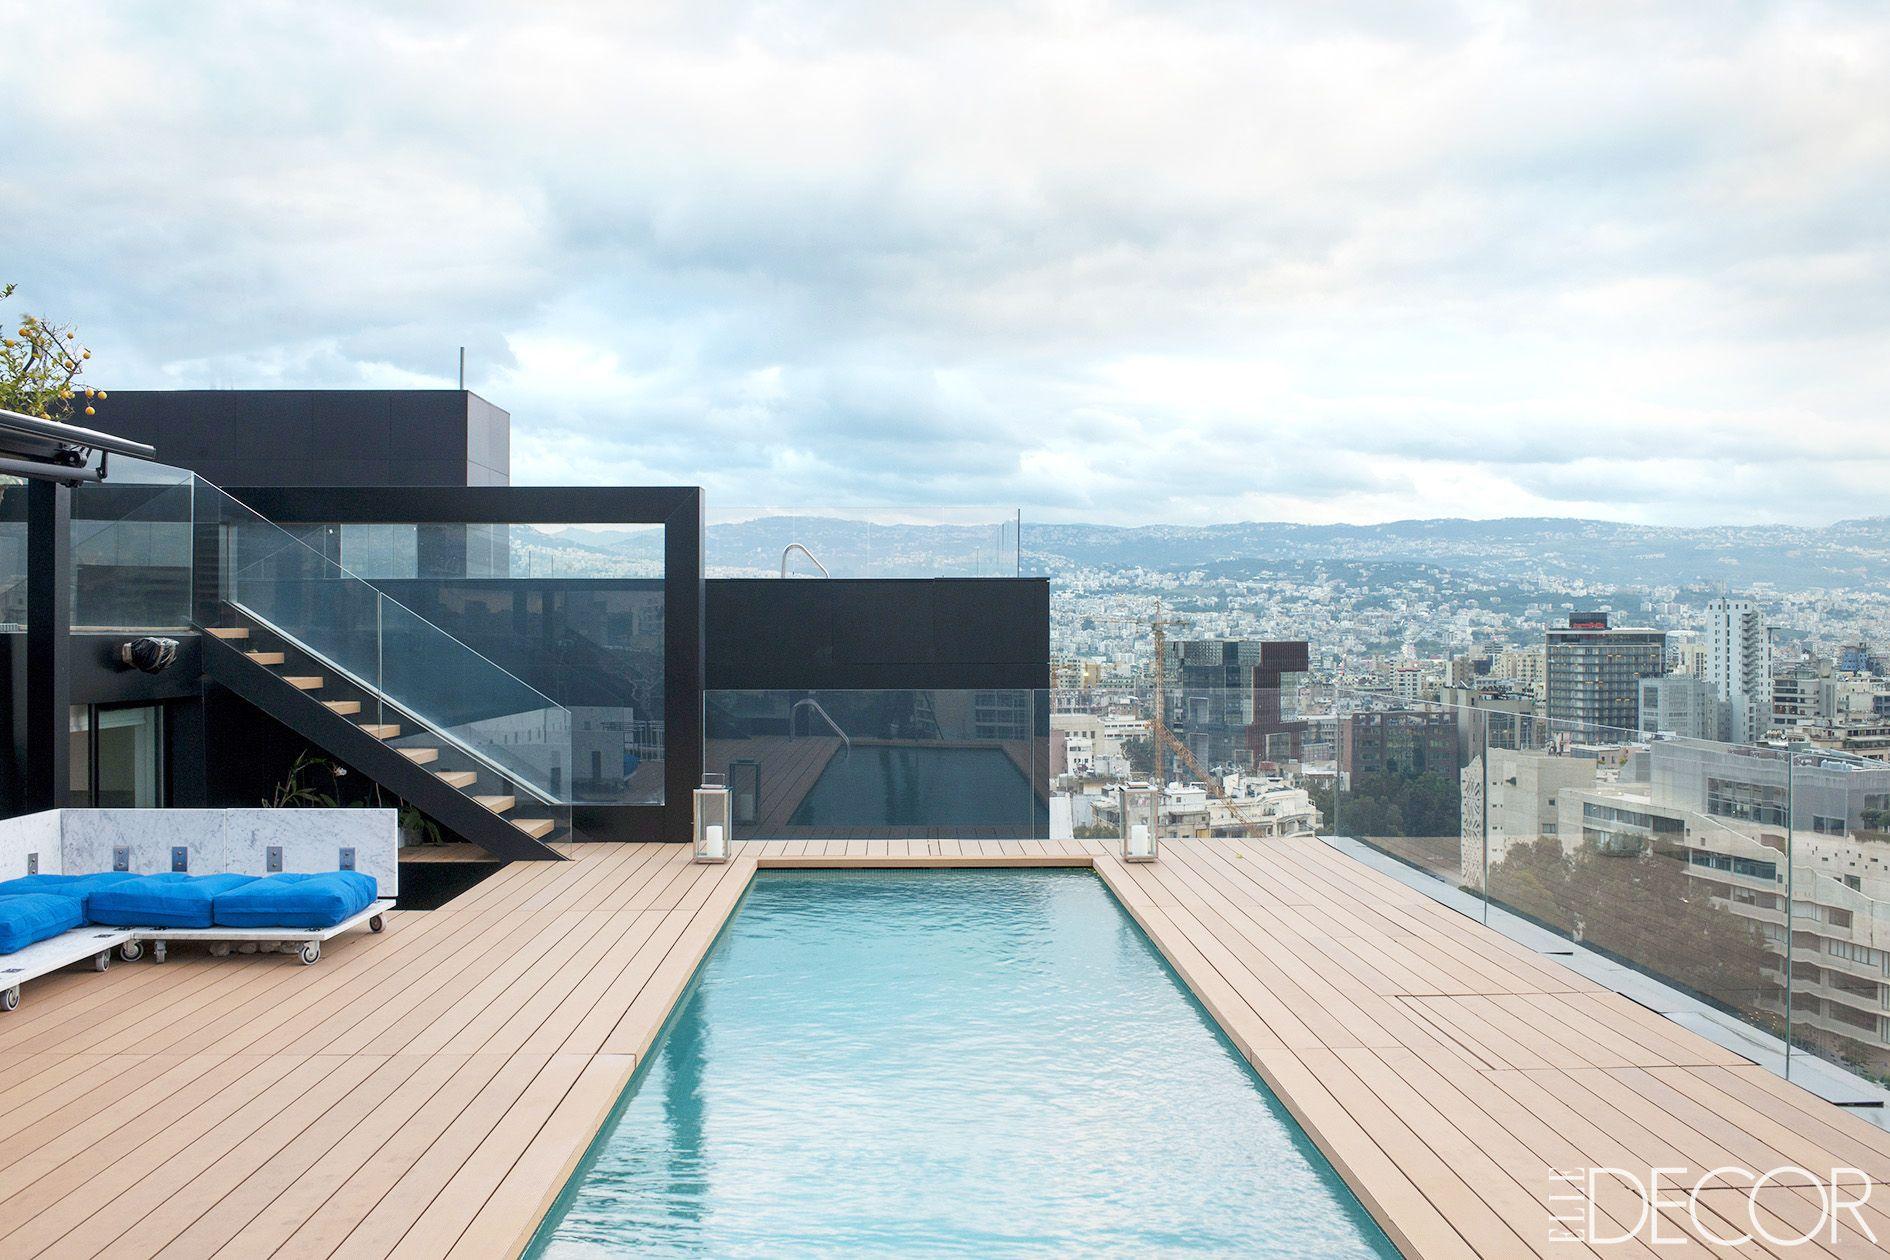 Ordinaire Pool Designs   Pool Design Ideas